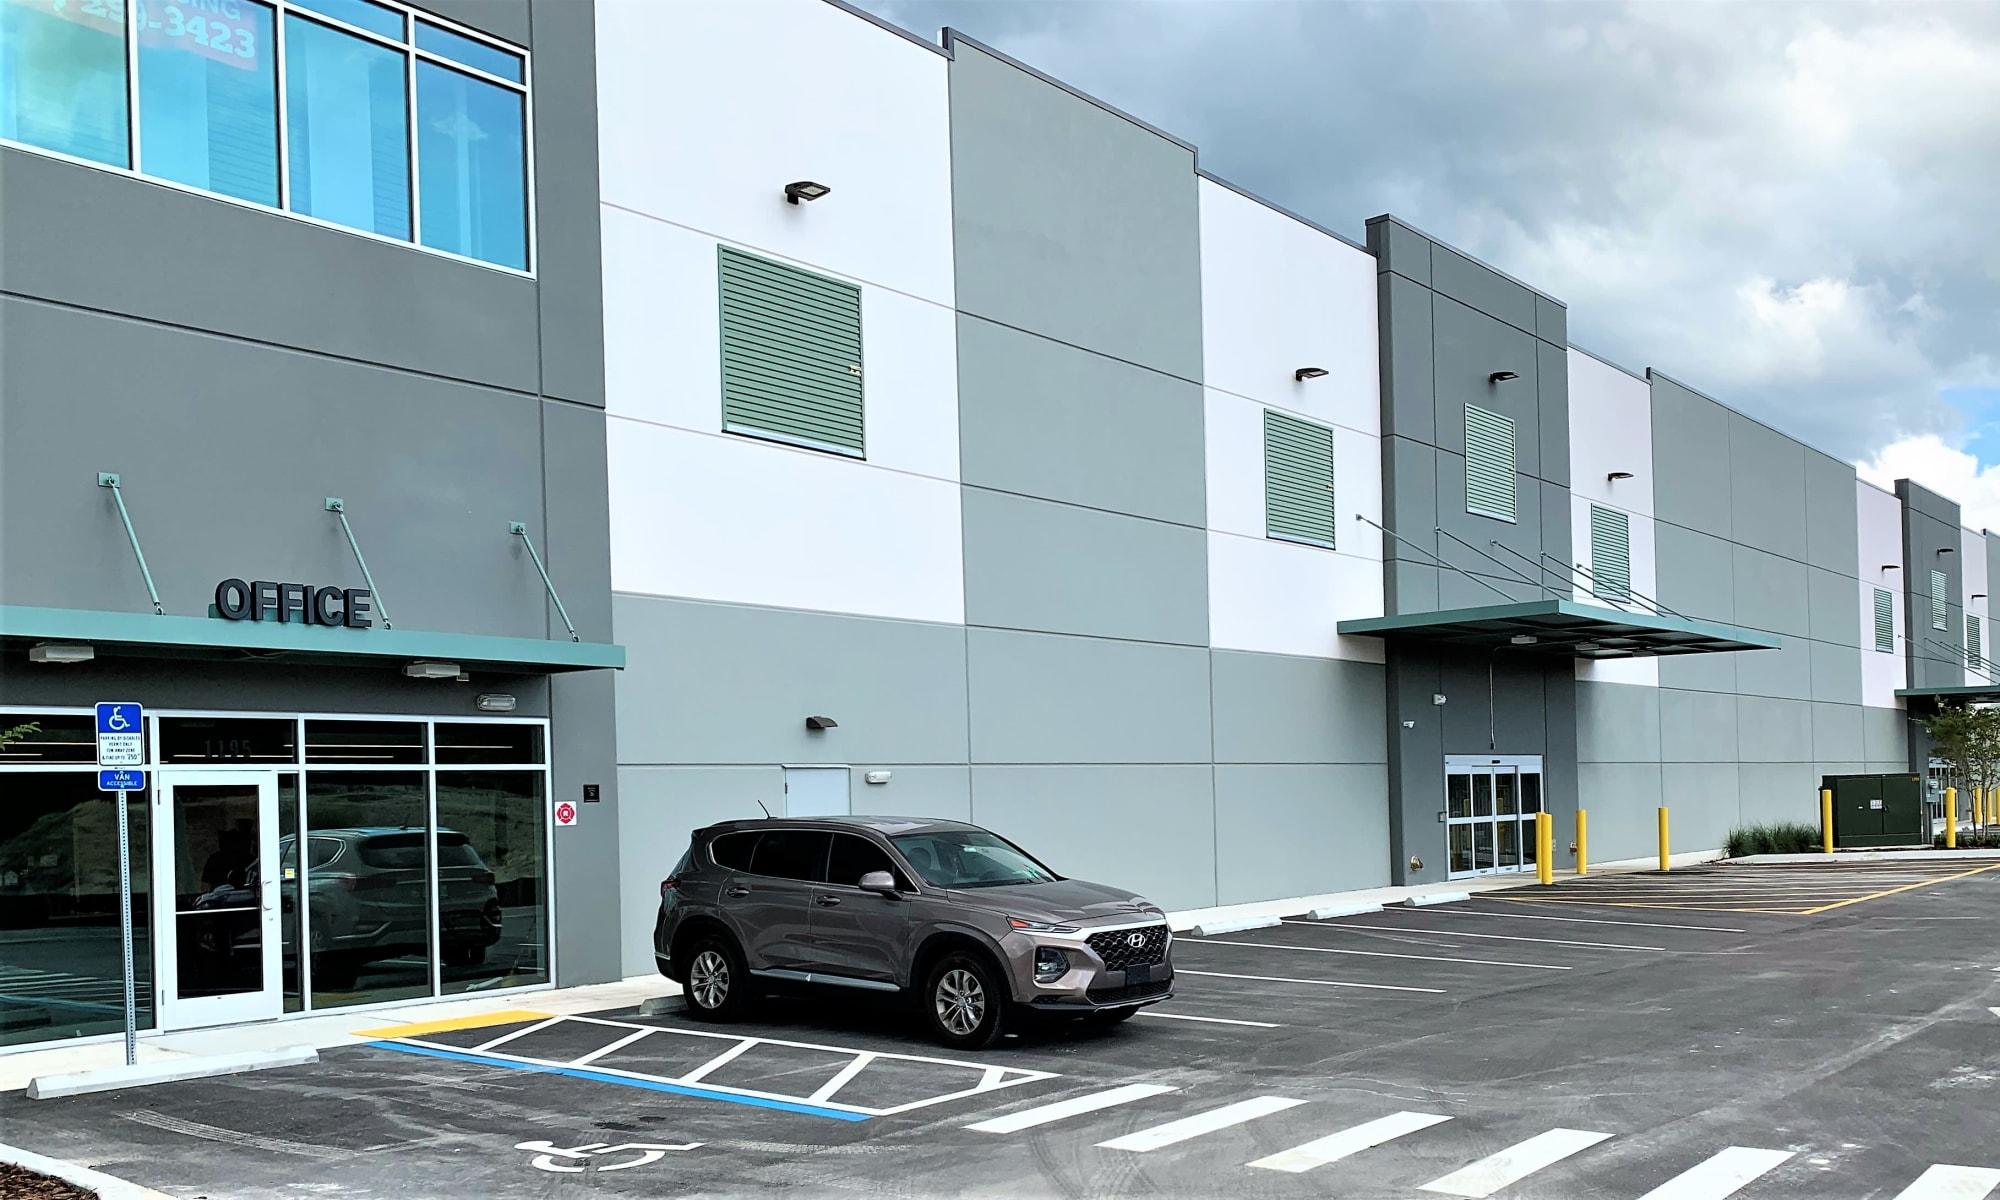 My Neighborhood Storage Center self storage in Jacksonville, Florida